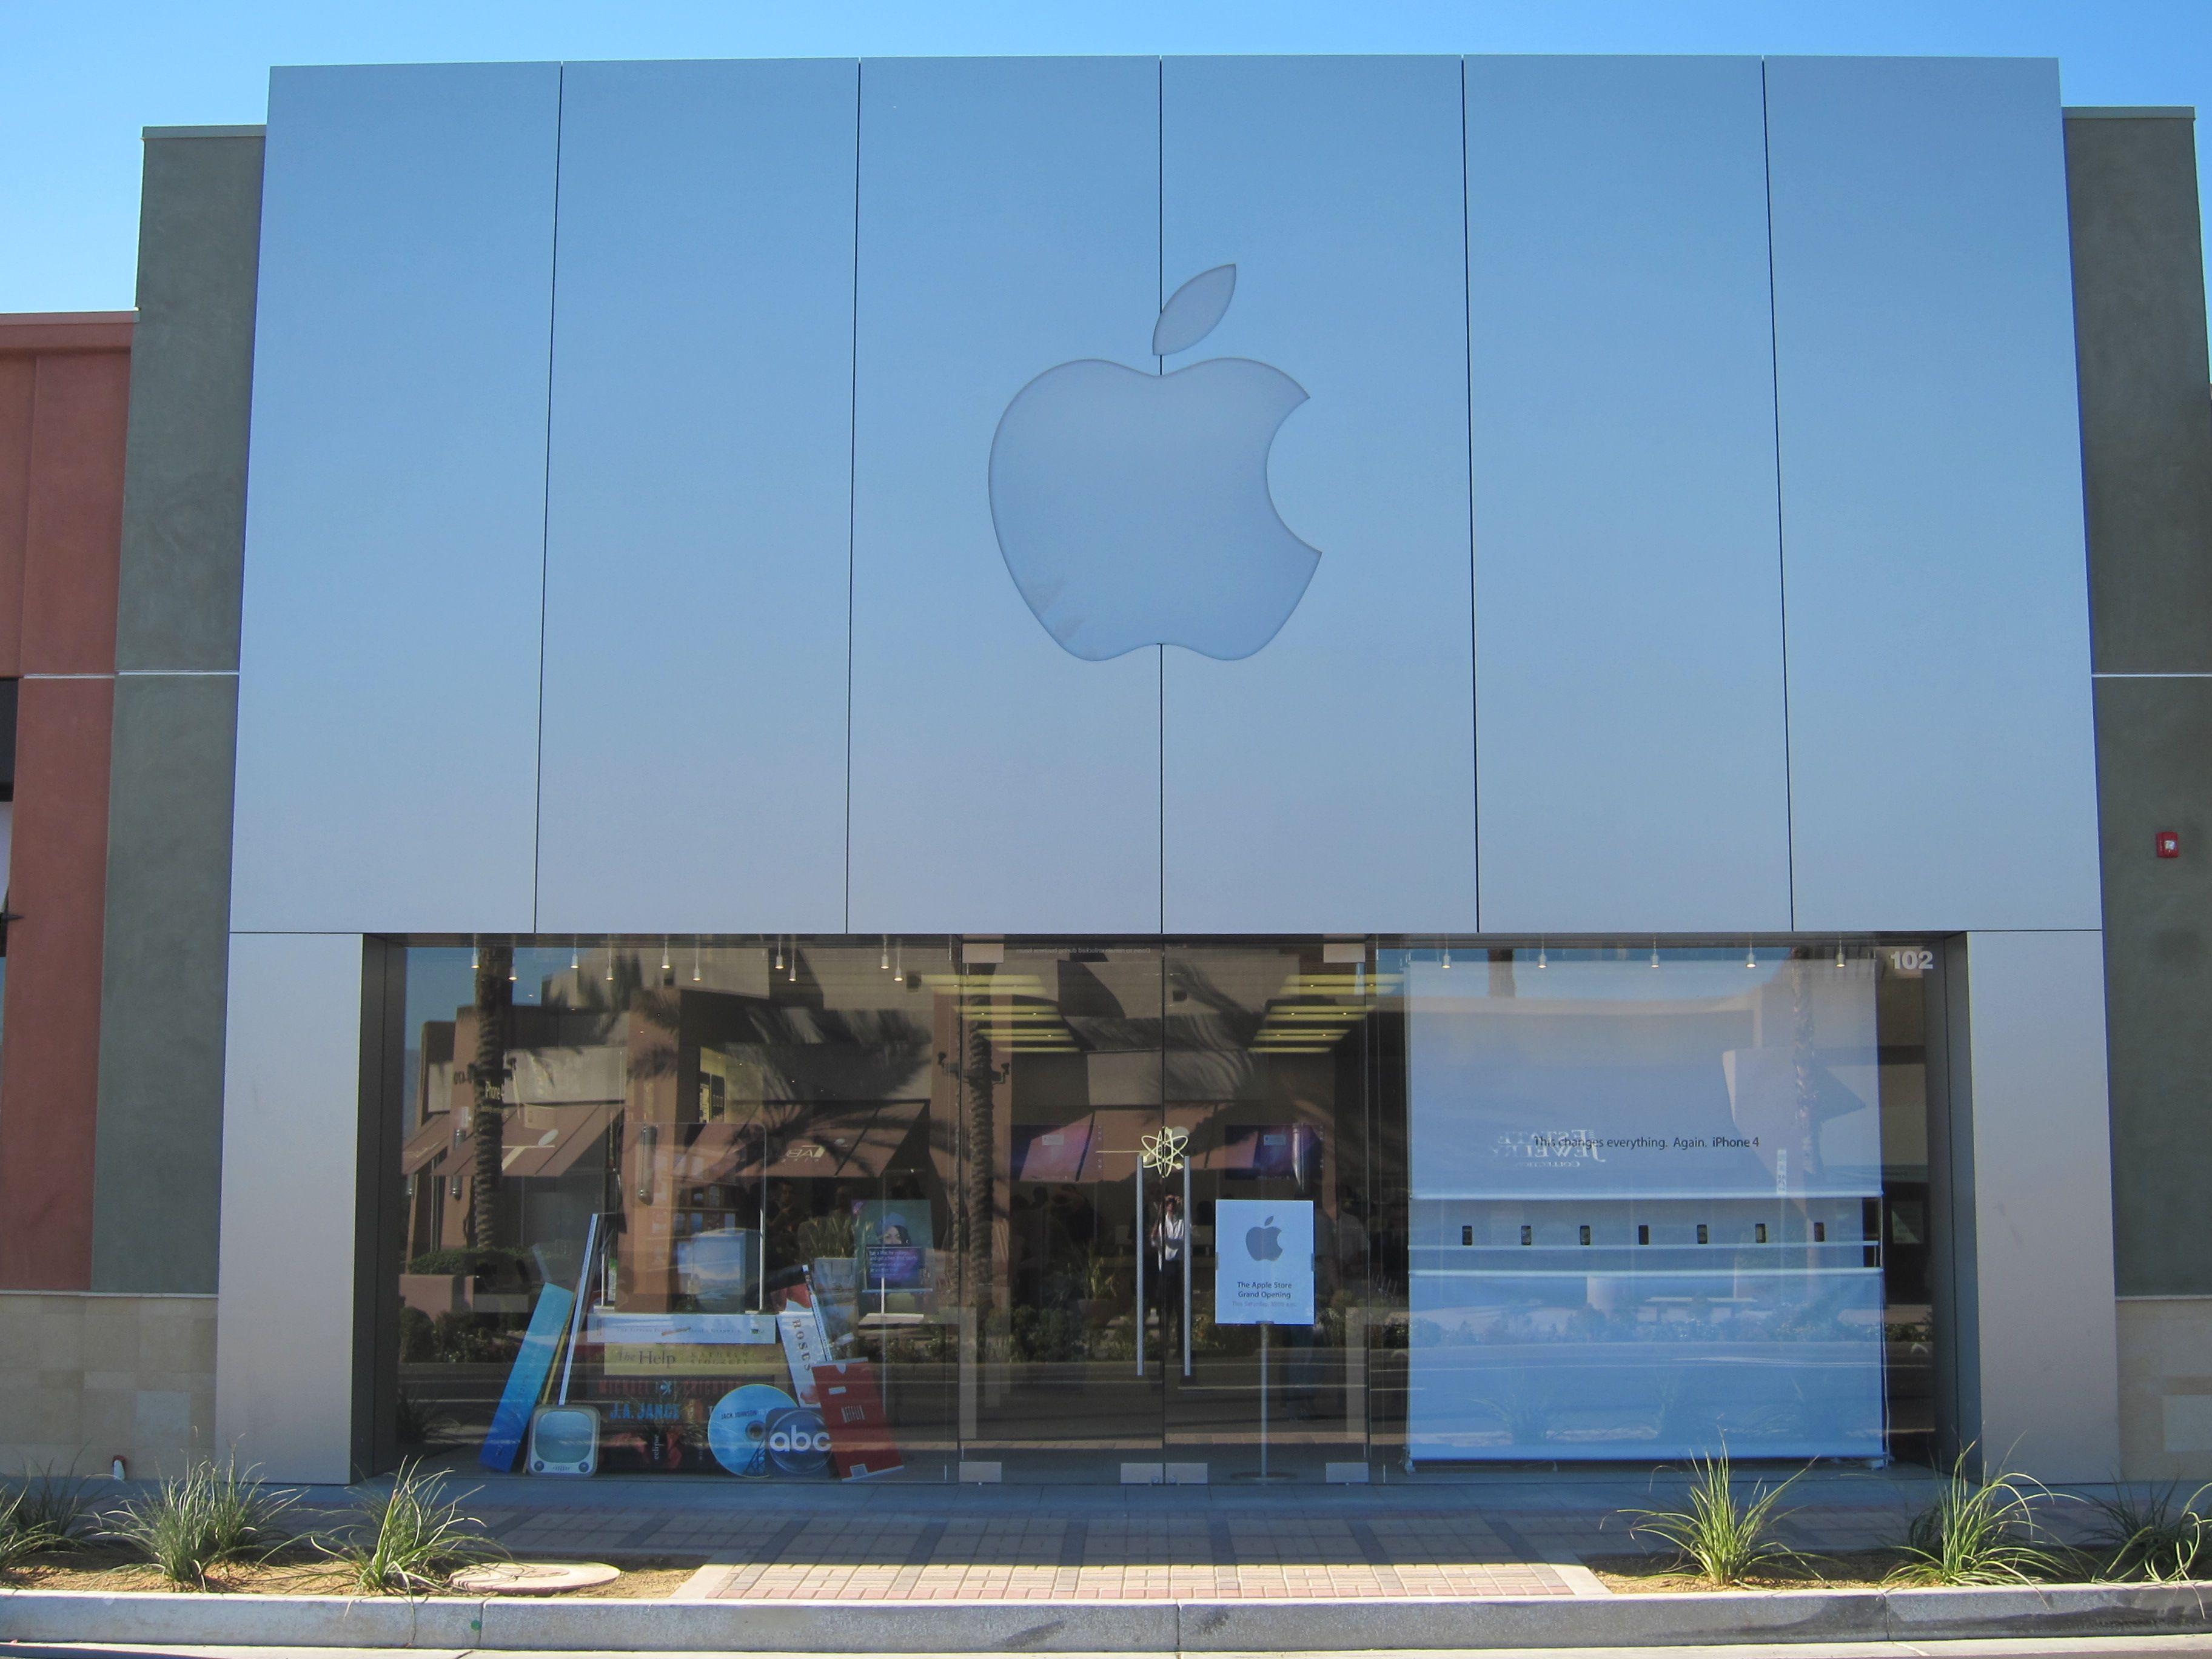 Apple Store on El Paseo in Palm Desert, CA   Shops, Restaurants ...